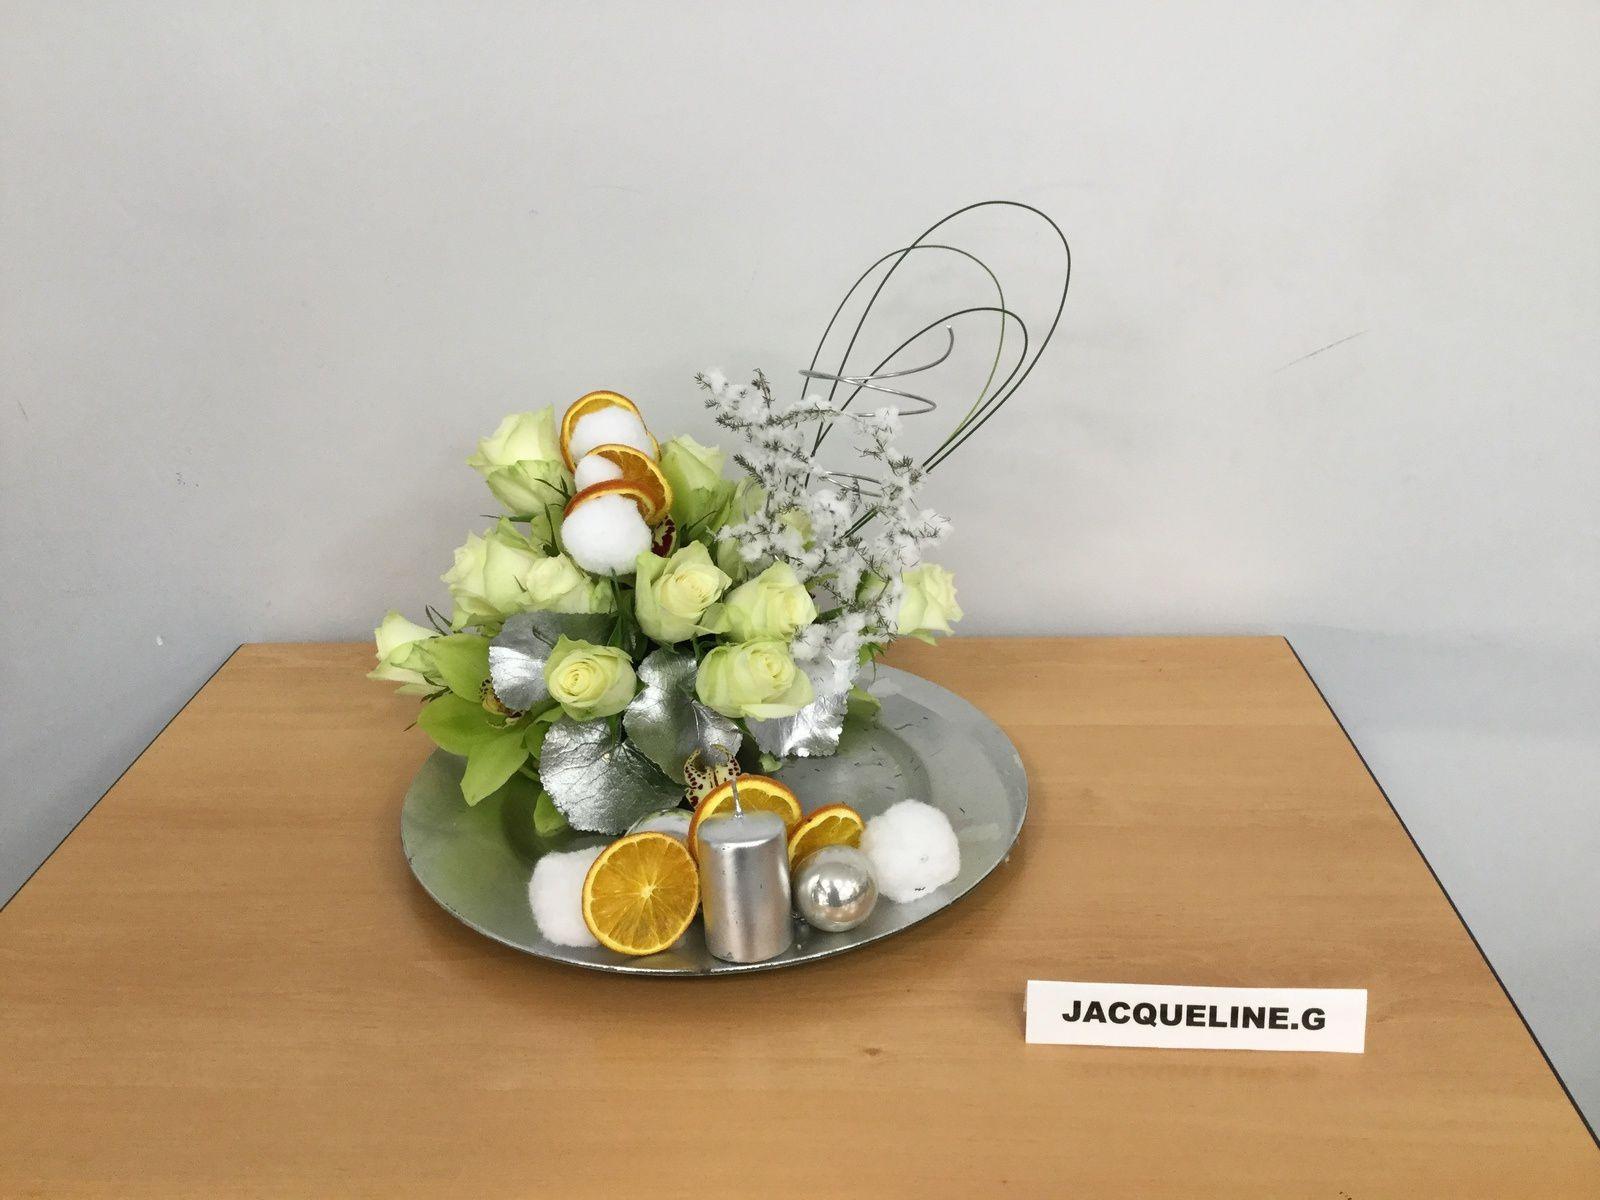 Cymbidium, Roses, Galax, Flexi-grass.